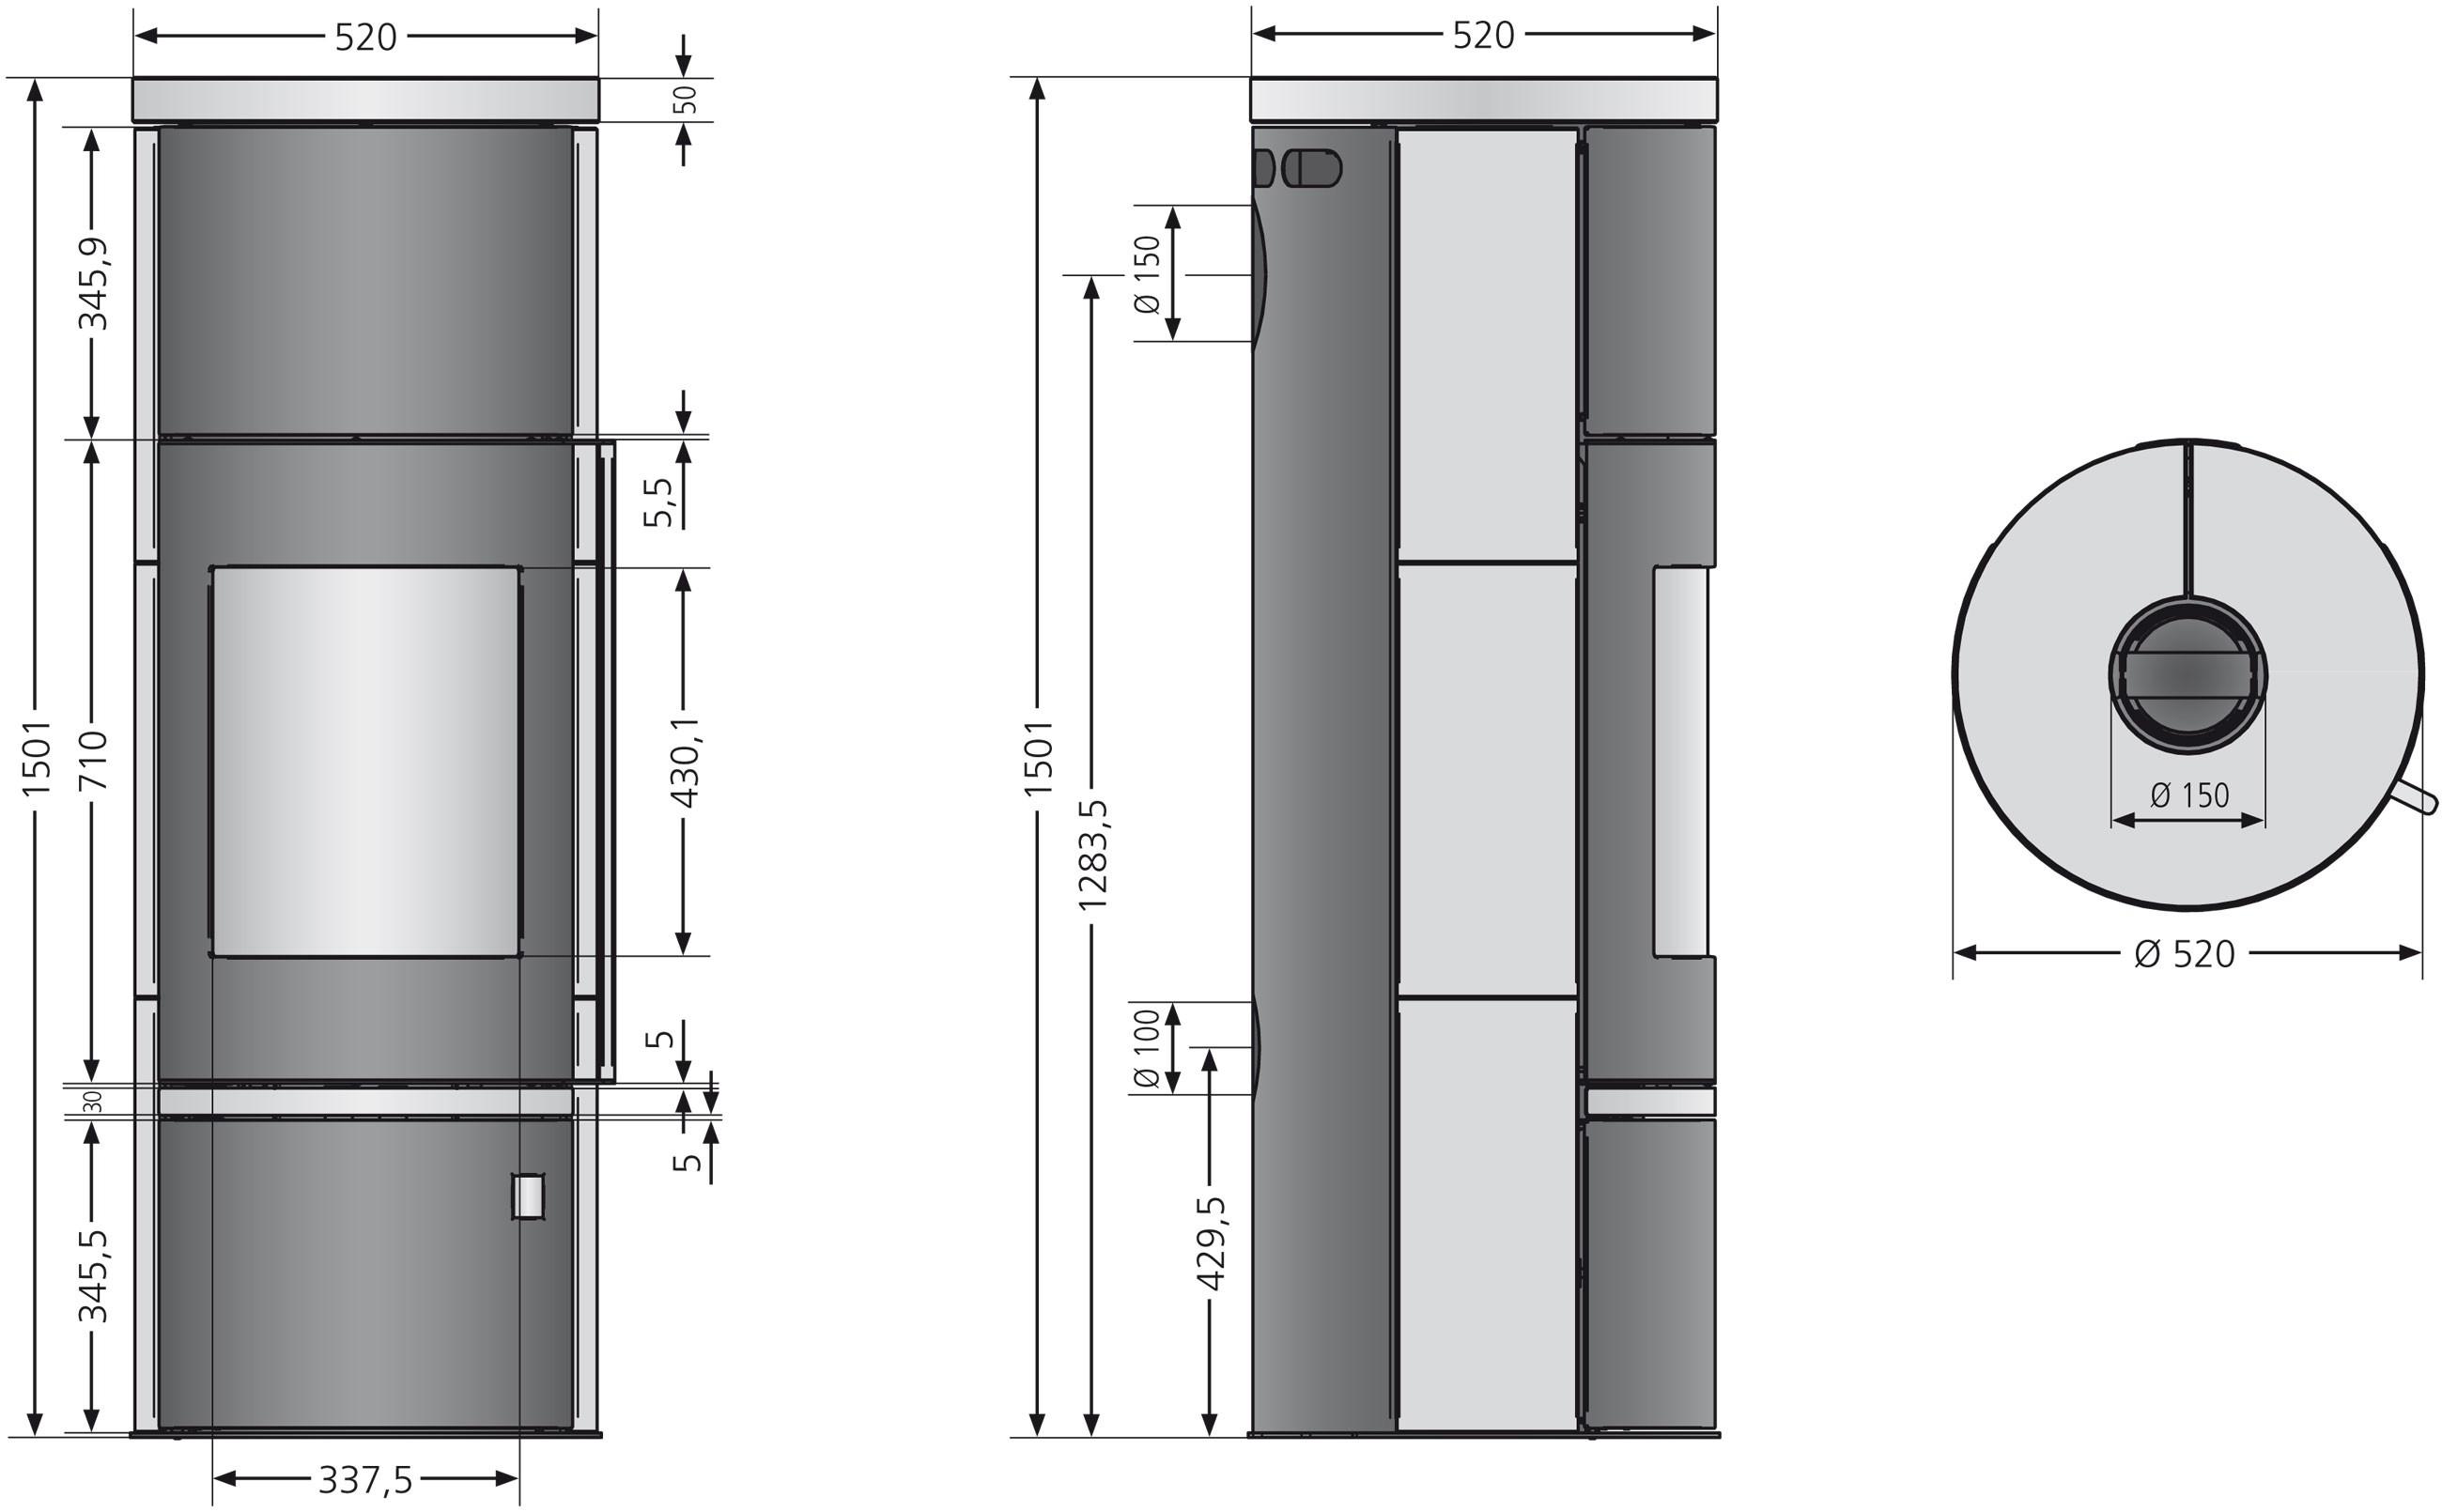 Kaminofen Justus Faro W+ 2.0 raumluftunabhängig schwarz Kalkstein 7kW Bild 4